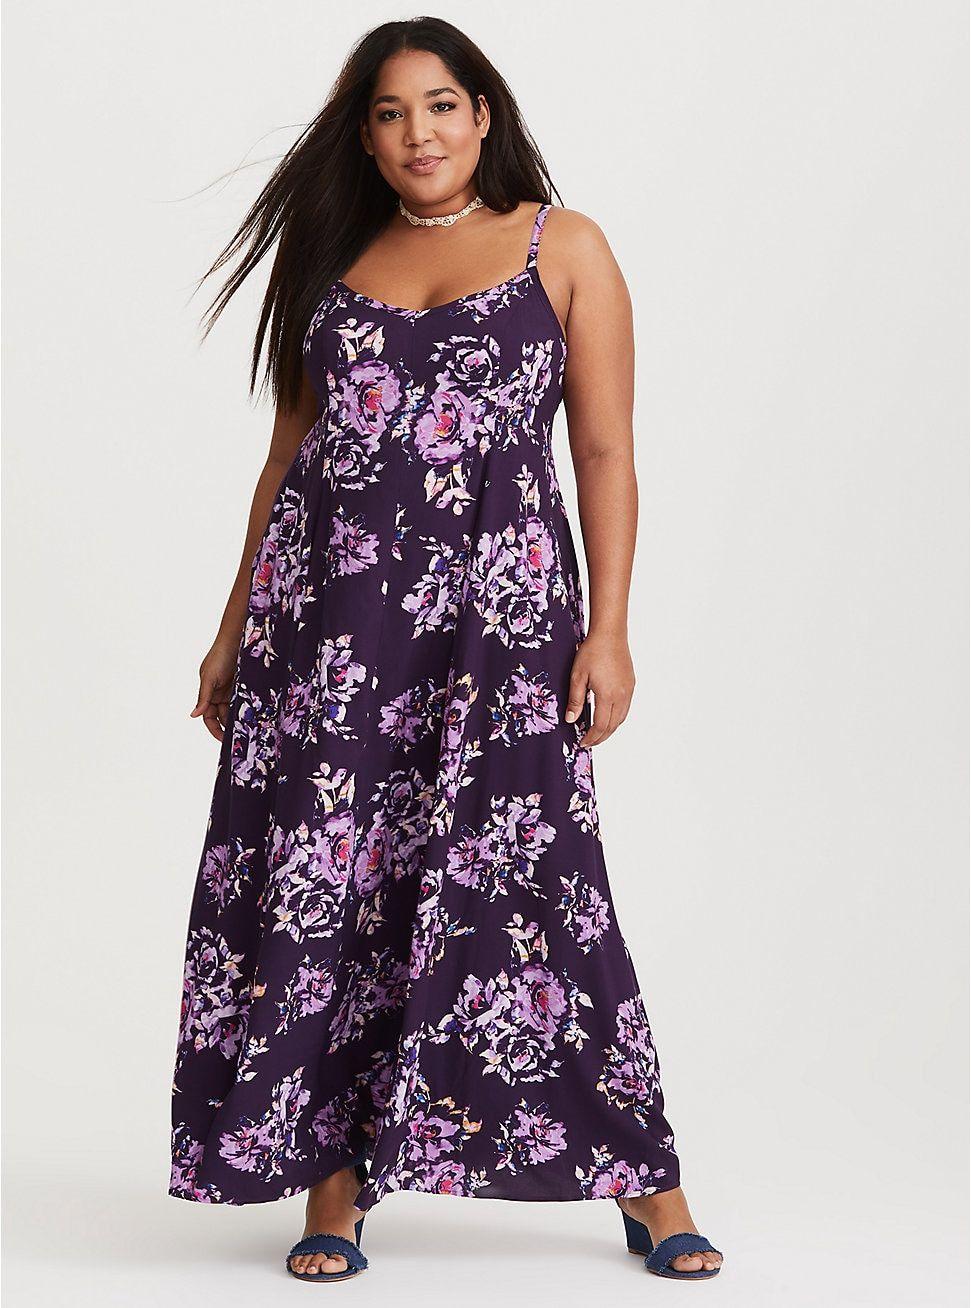 d00fb9d35e4 Floral Challis Maxi Dress (Short Inseam Now Available) in 2019 ...